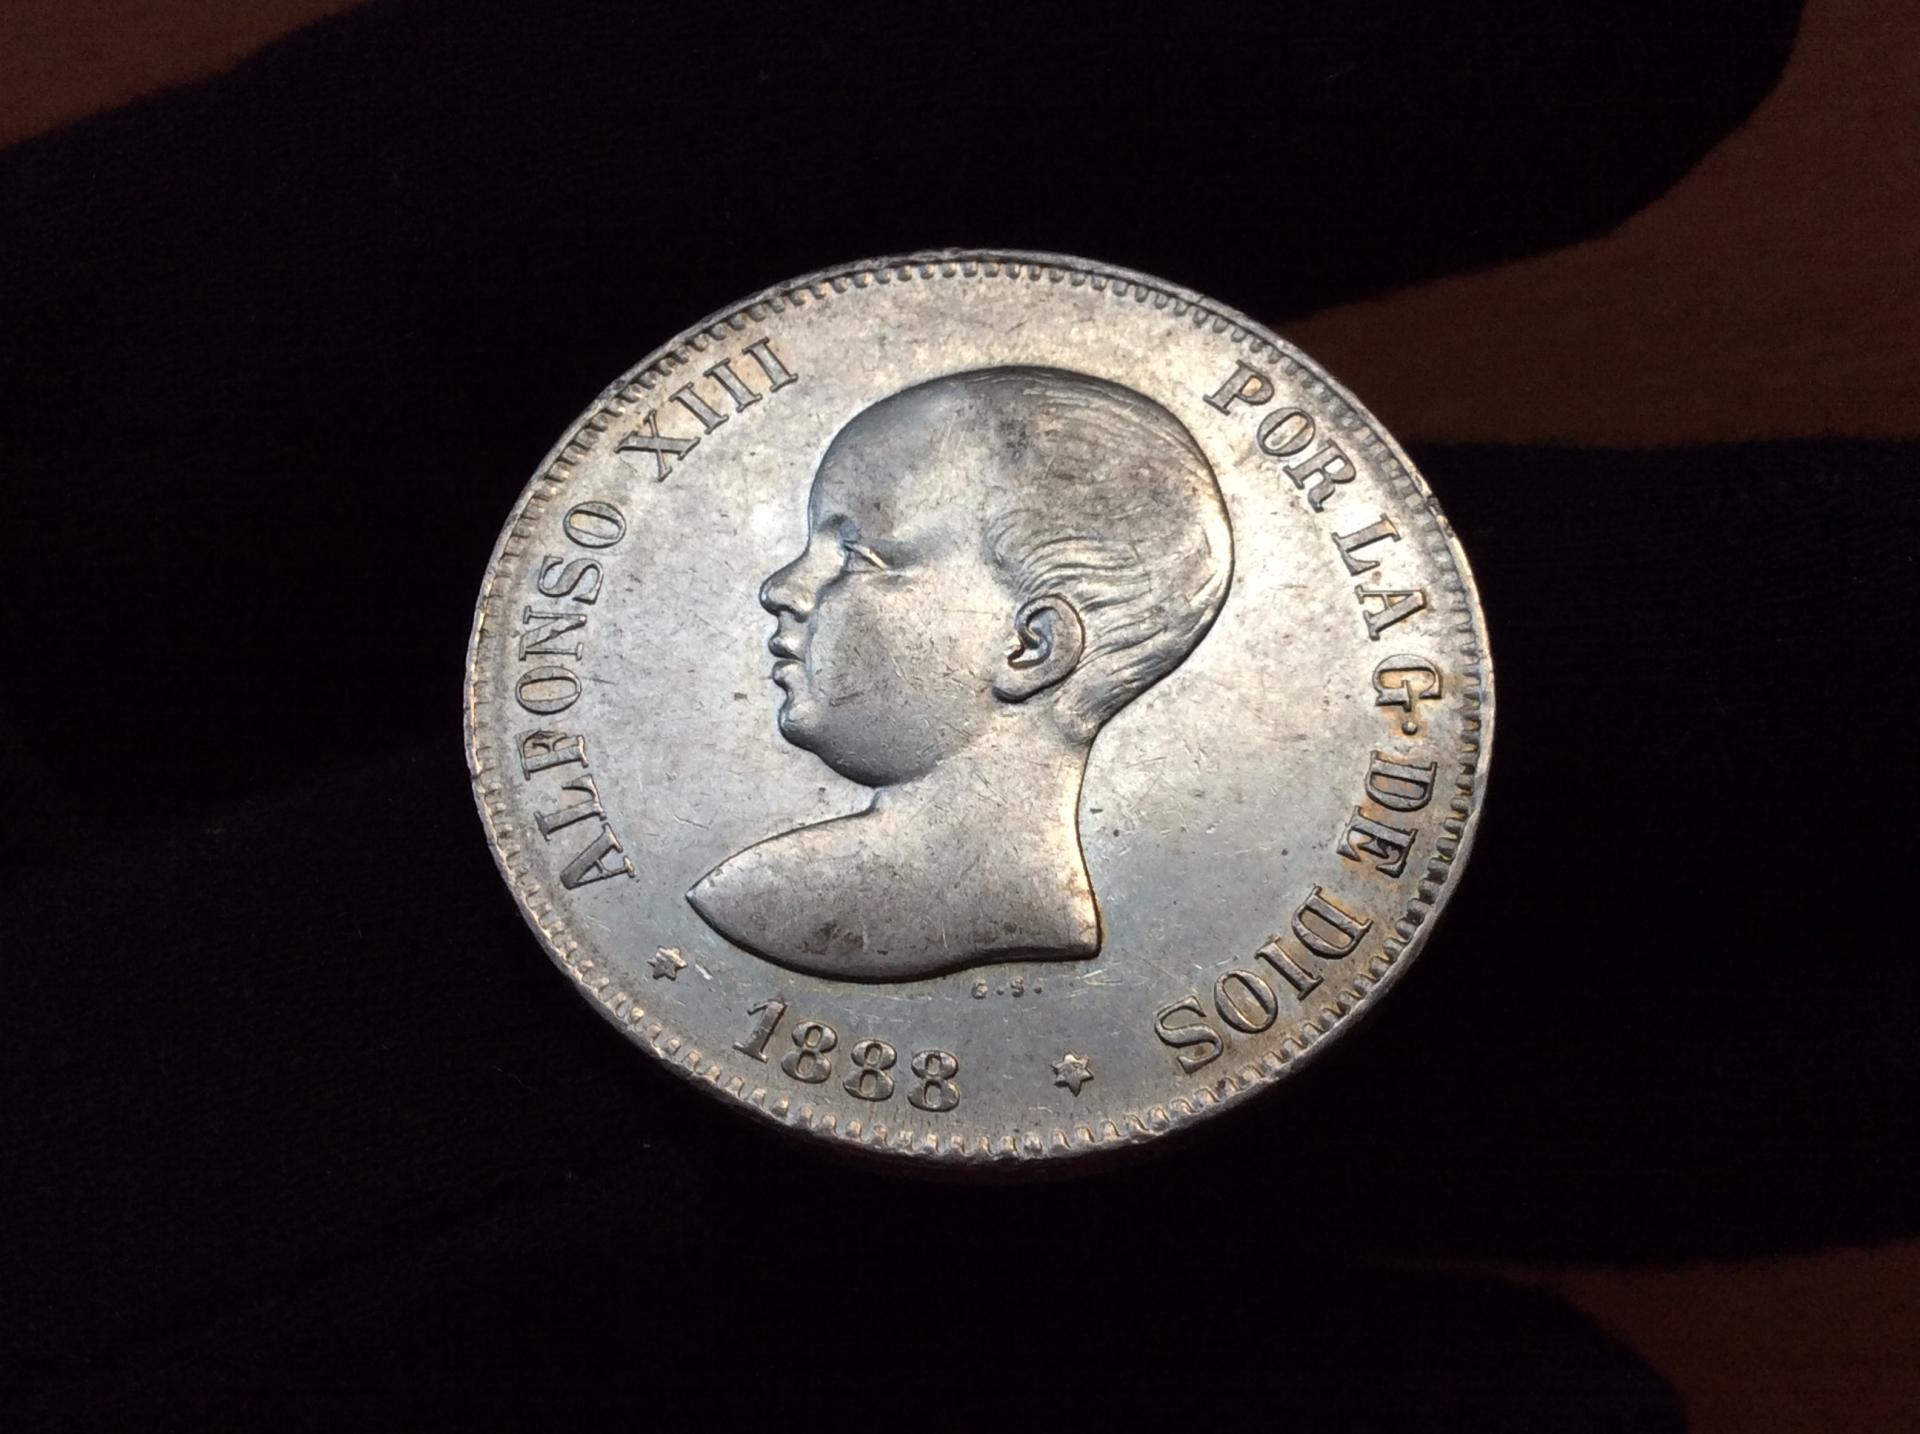 5 PESETAS PLATA 1888 - ALFONSO XIII - PELÓN - GRAN CALIDAD